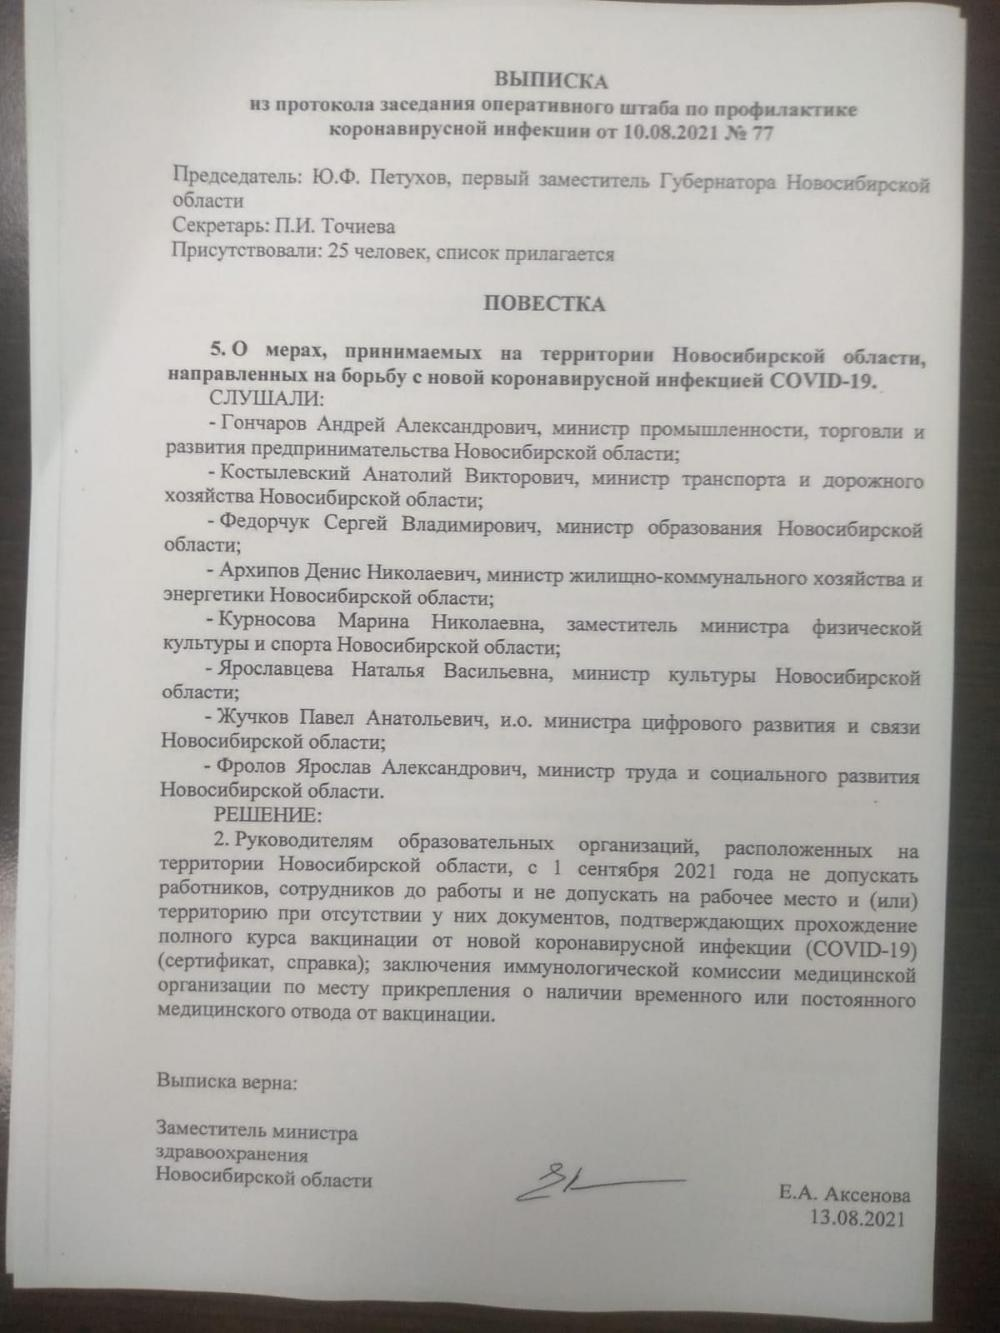 Фото В Новосибирской области объявили обязательную вакцинацию  работников образования от COVID-19 2